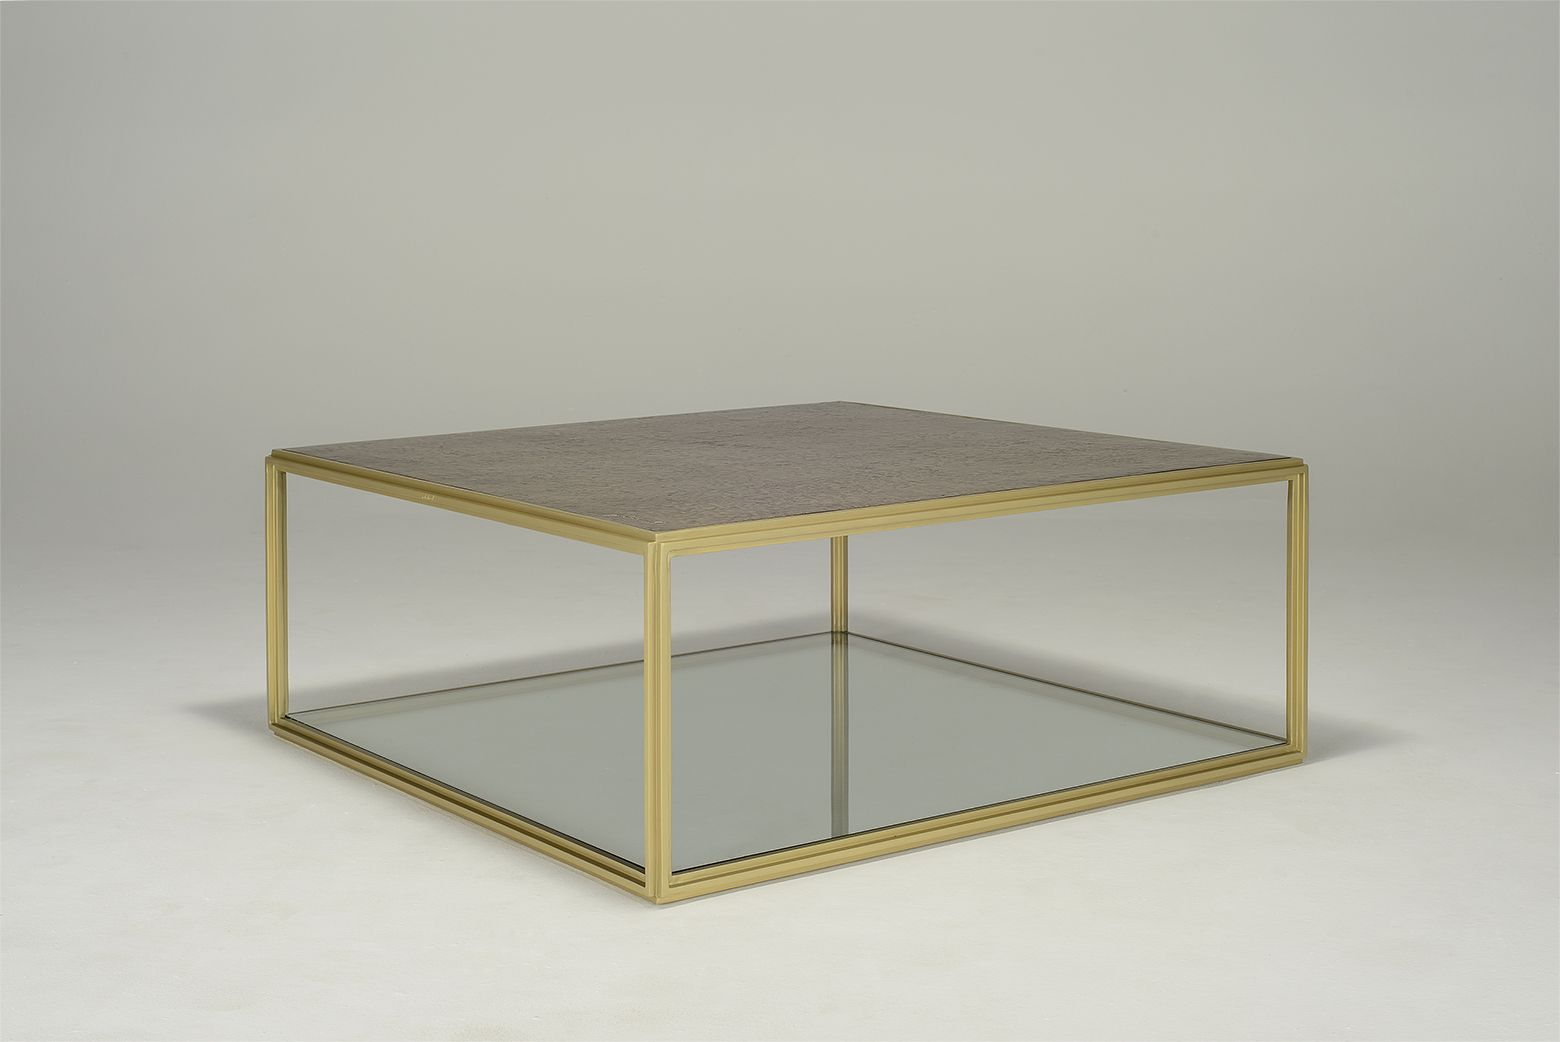 Marvelous Low Coffee Table Blt Pt6 Square Brass Bronze Top Golden Sand Creativecarmelina Interior Chair Design Creativecarmelinacom